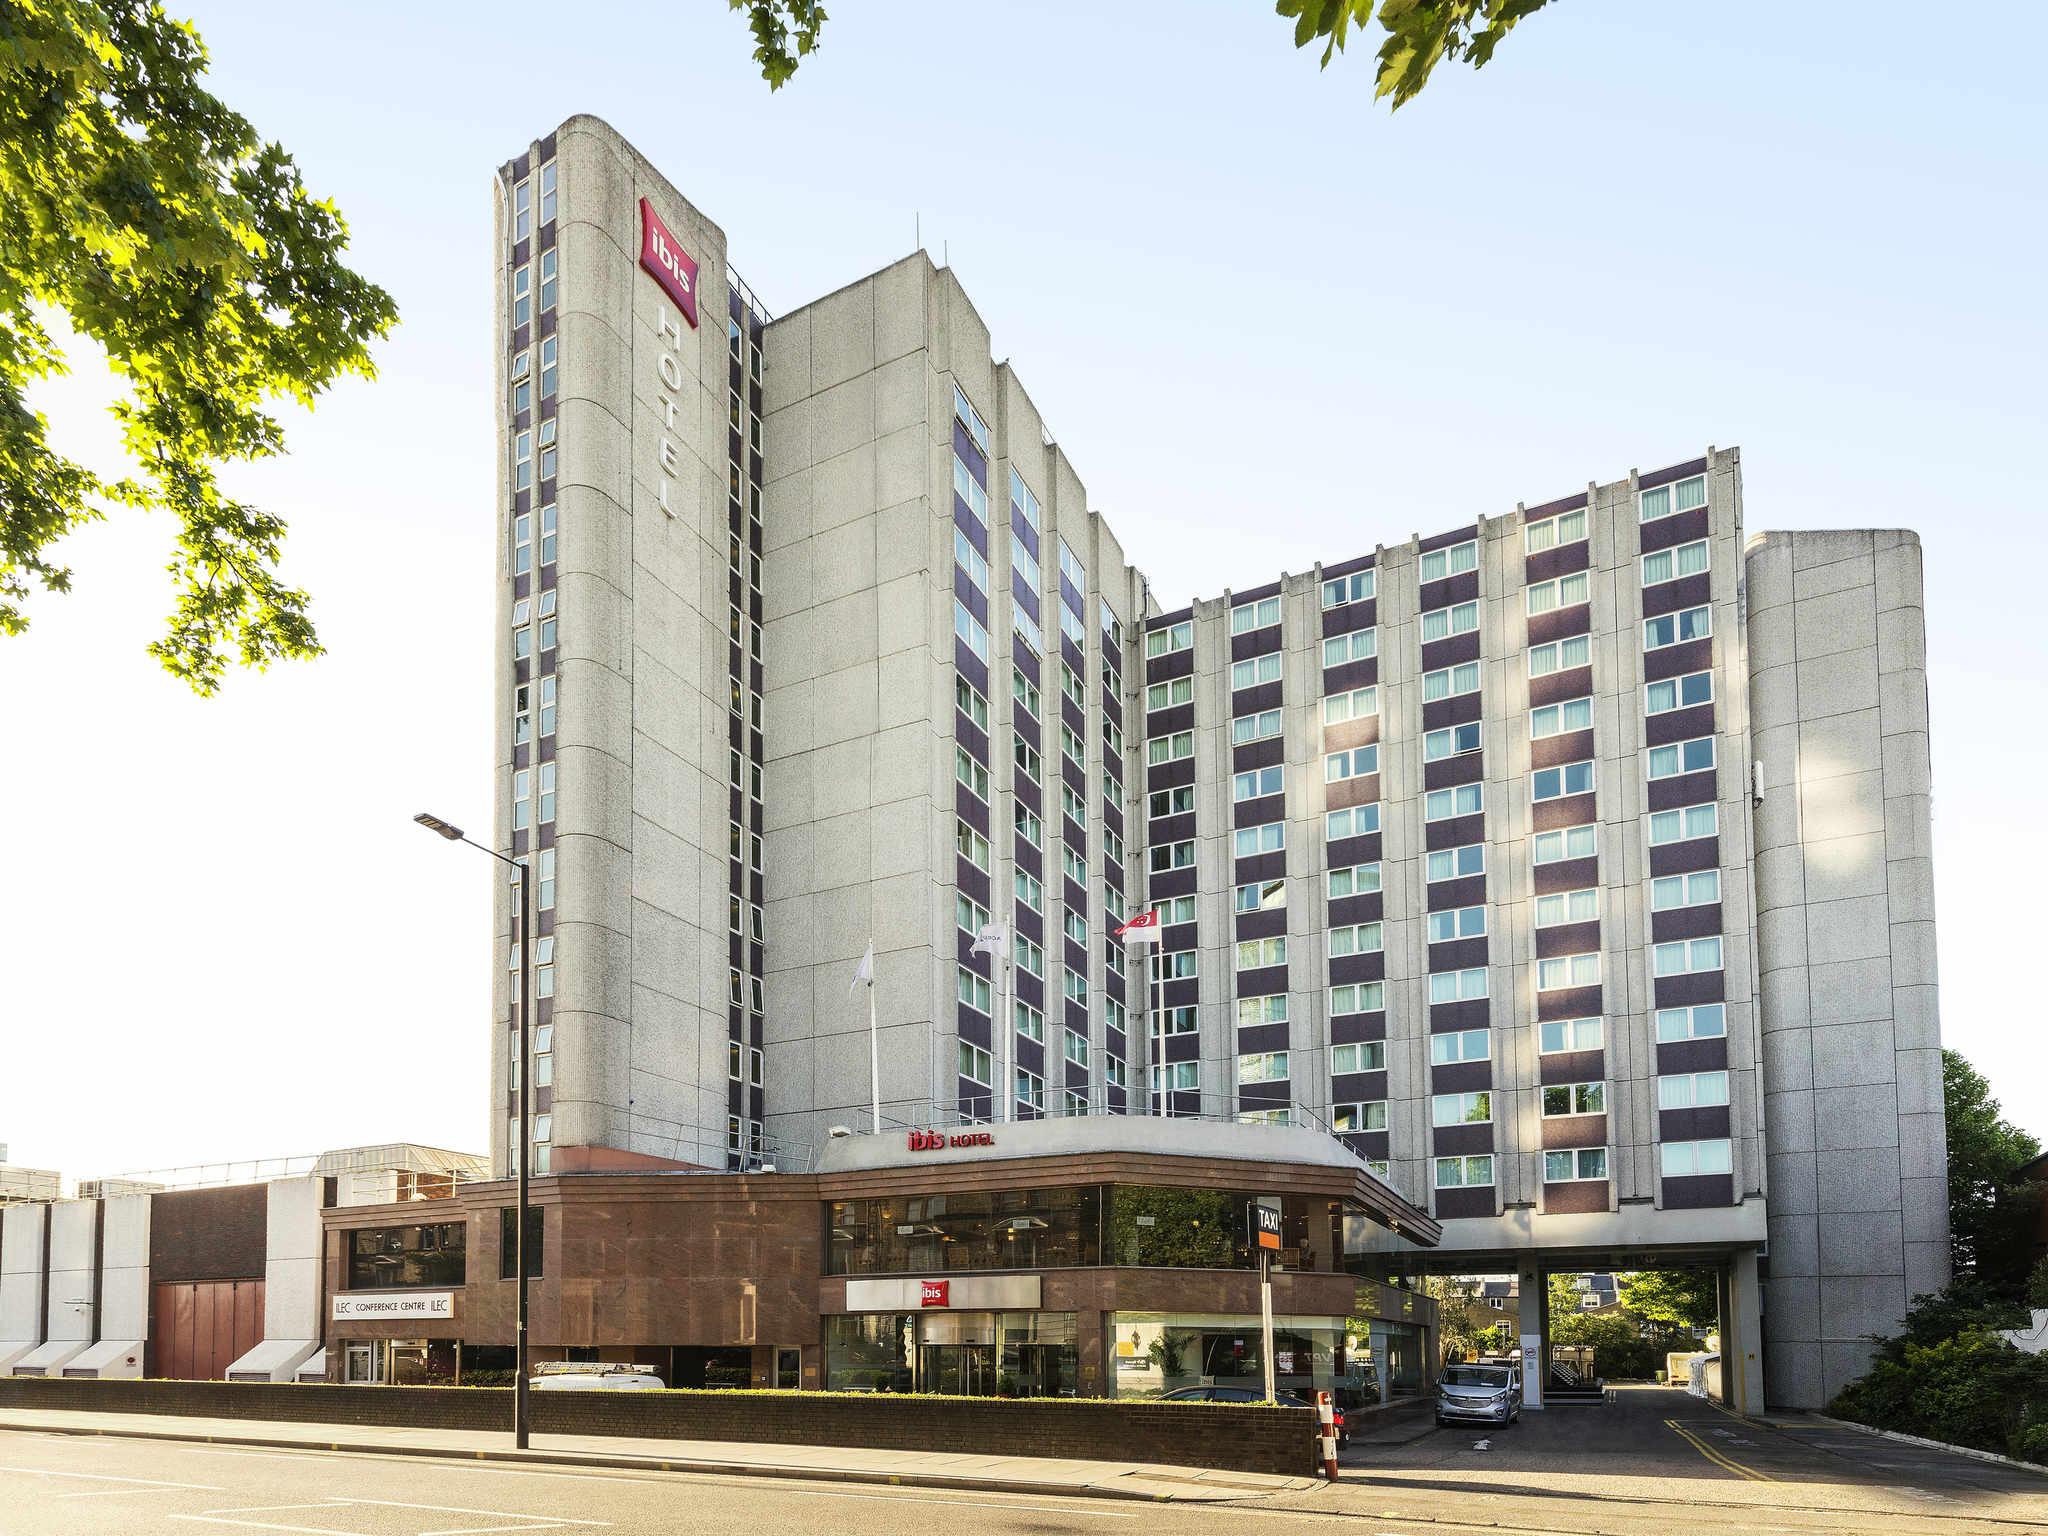 فندق - إيبيس ibis لندن ايرلز كورت